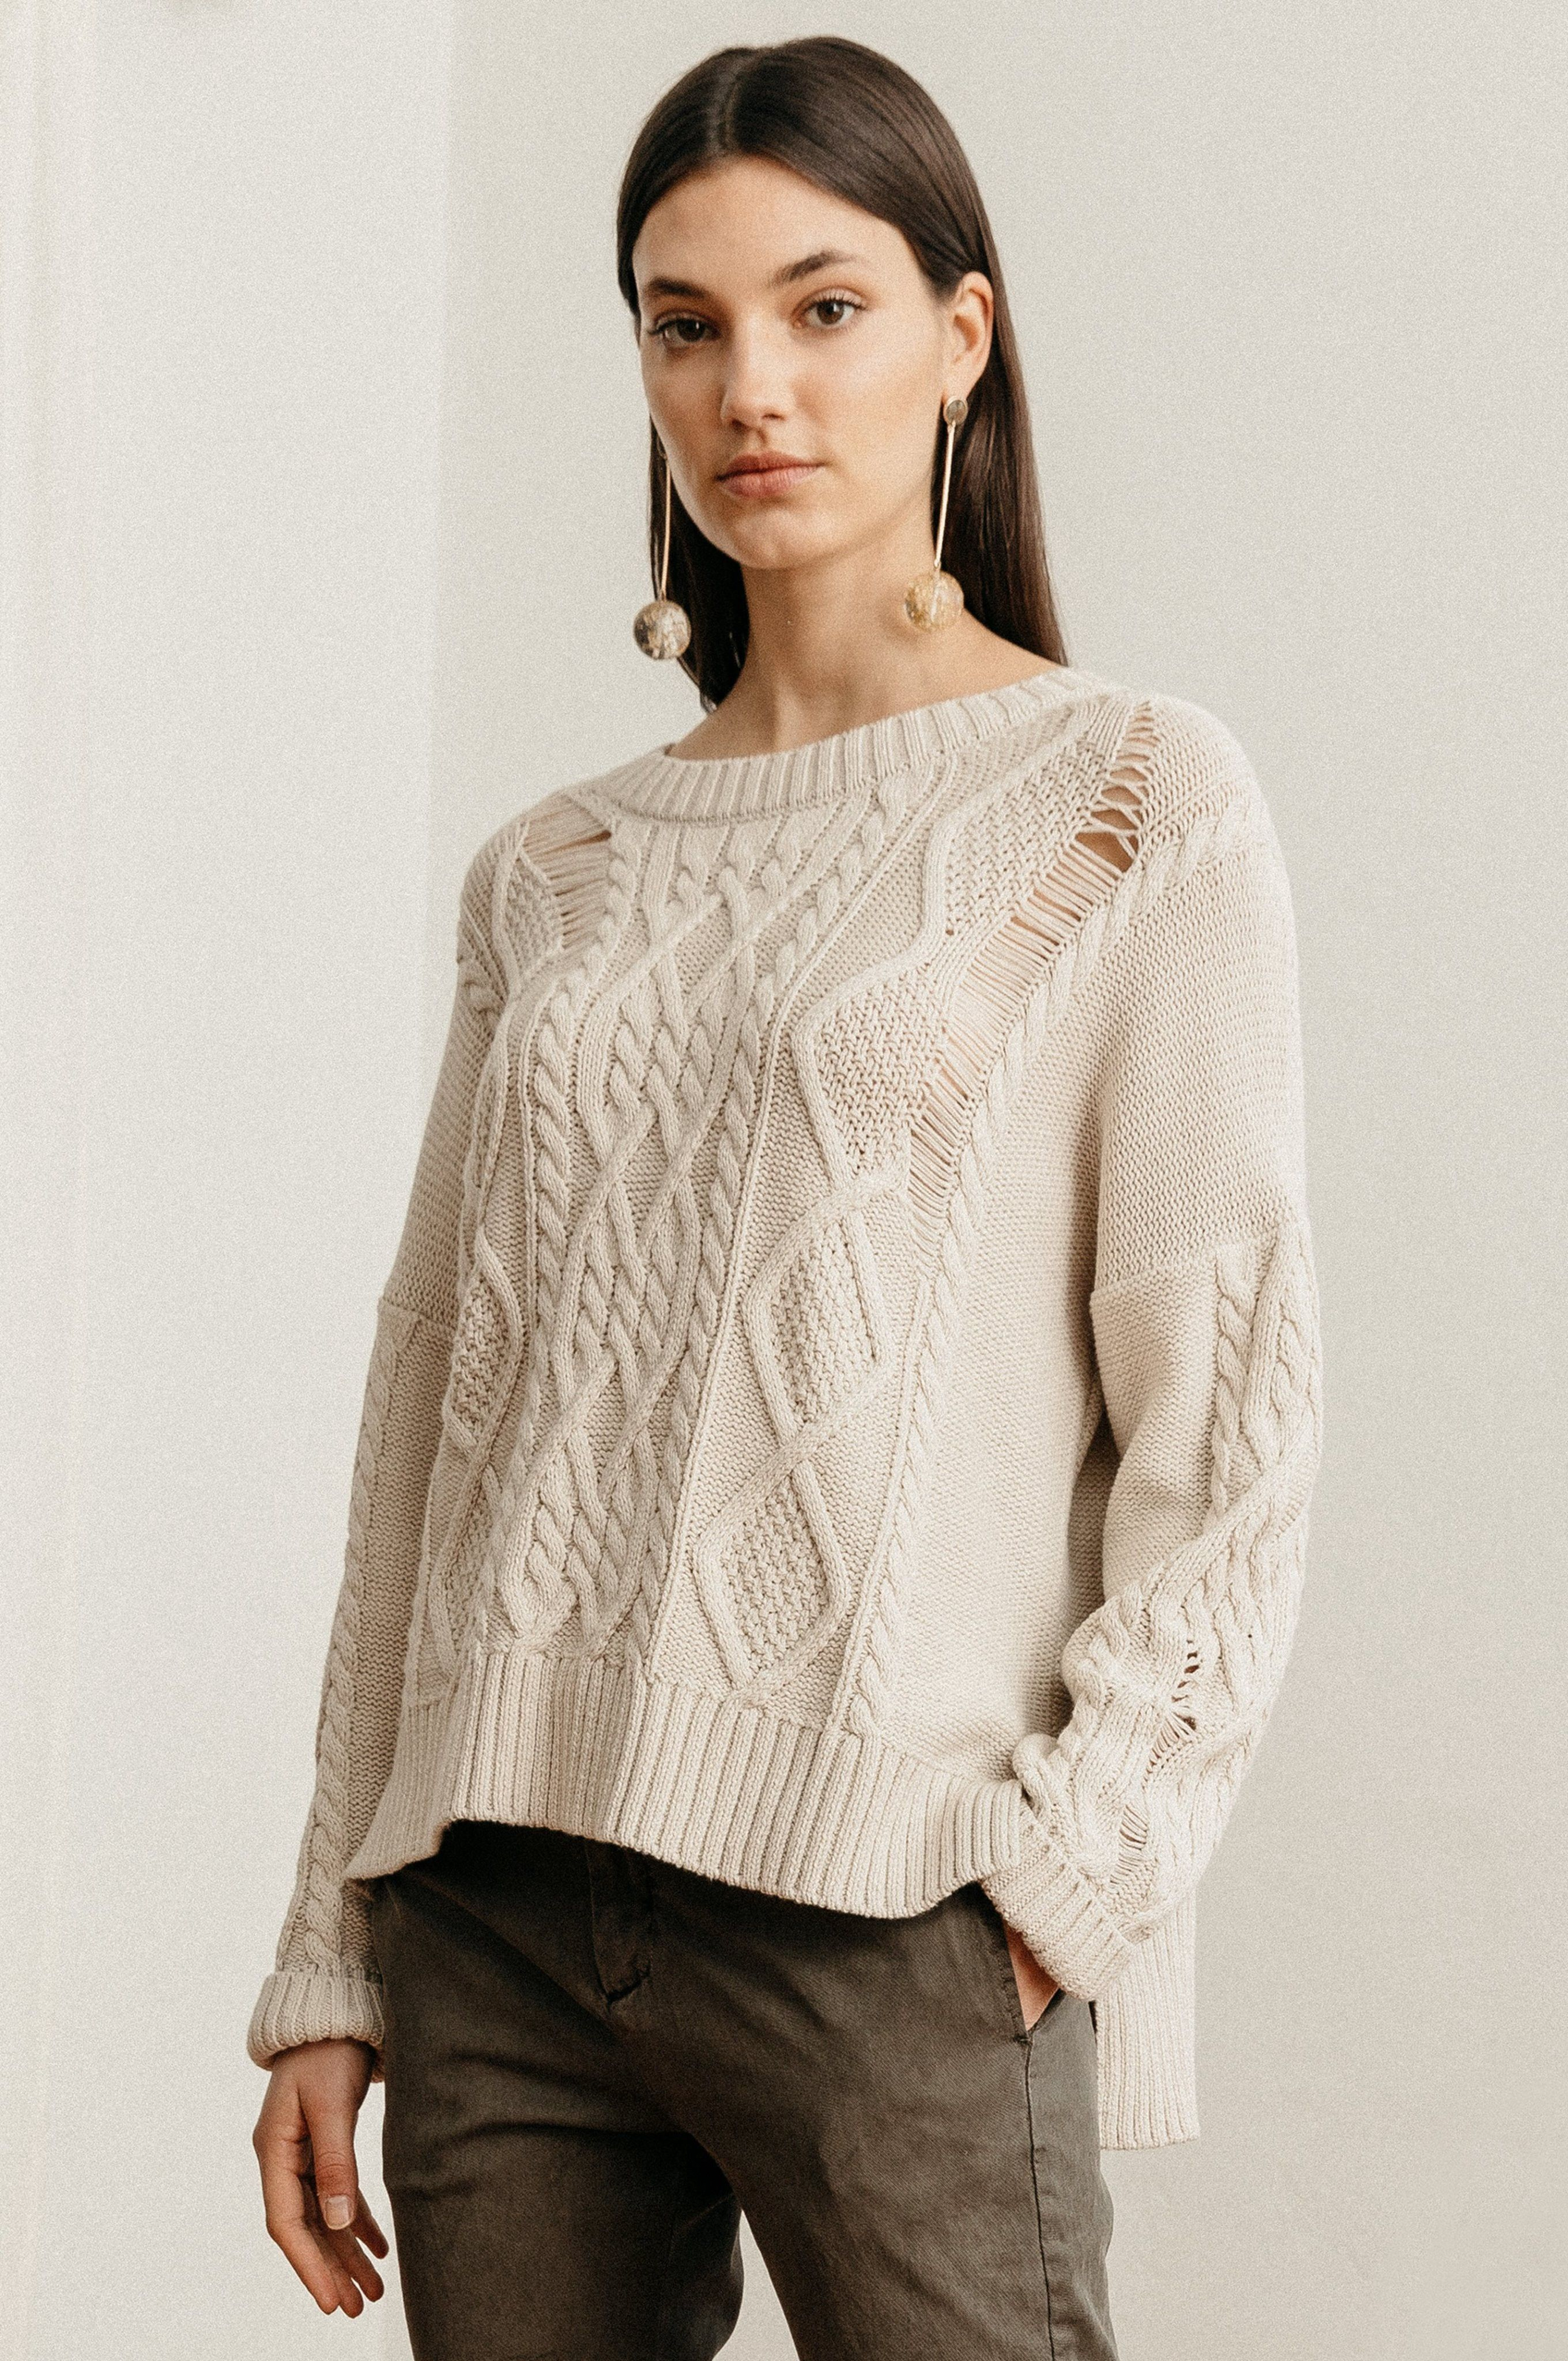 753dba3bd4e Rails Cambria - Ecru L Knitwear, Pullover, Knitting, Long Sleeve, Cotton,